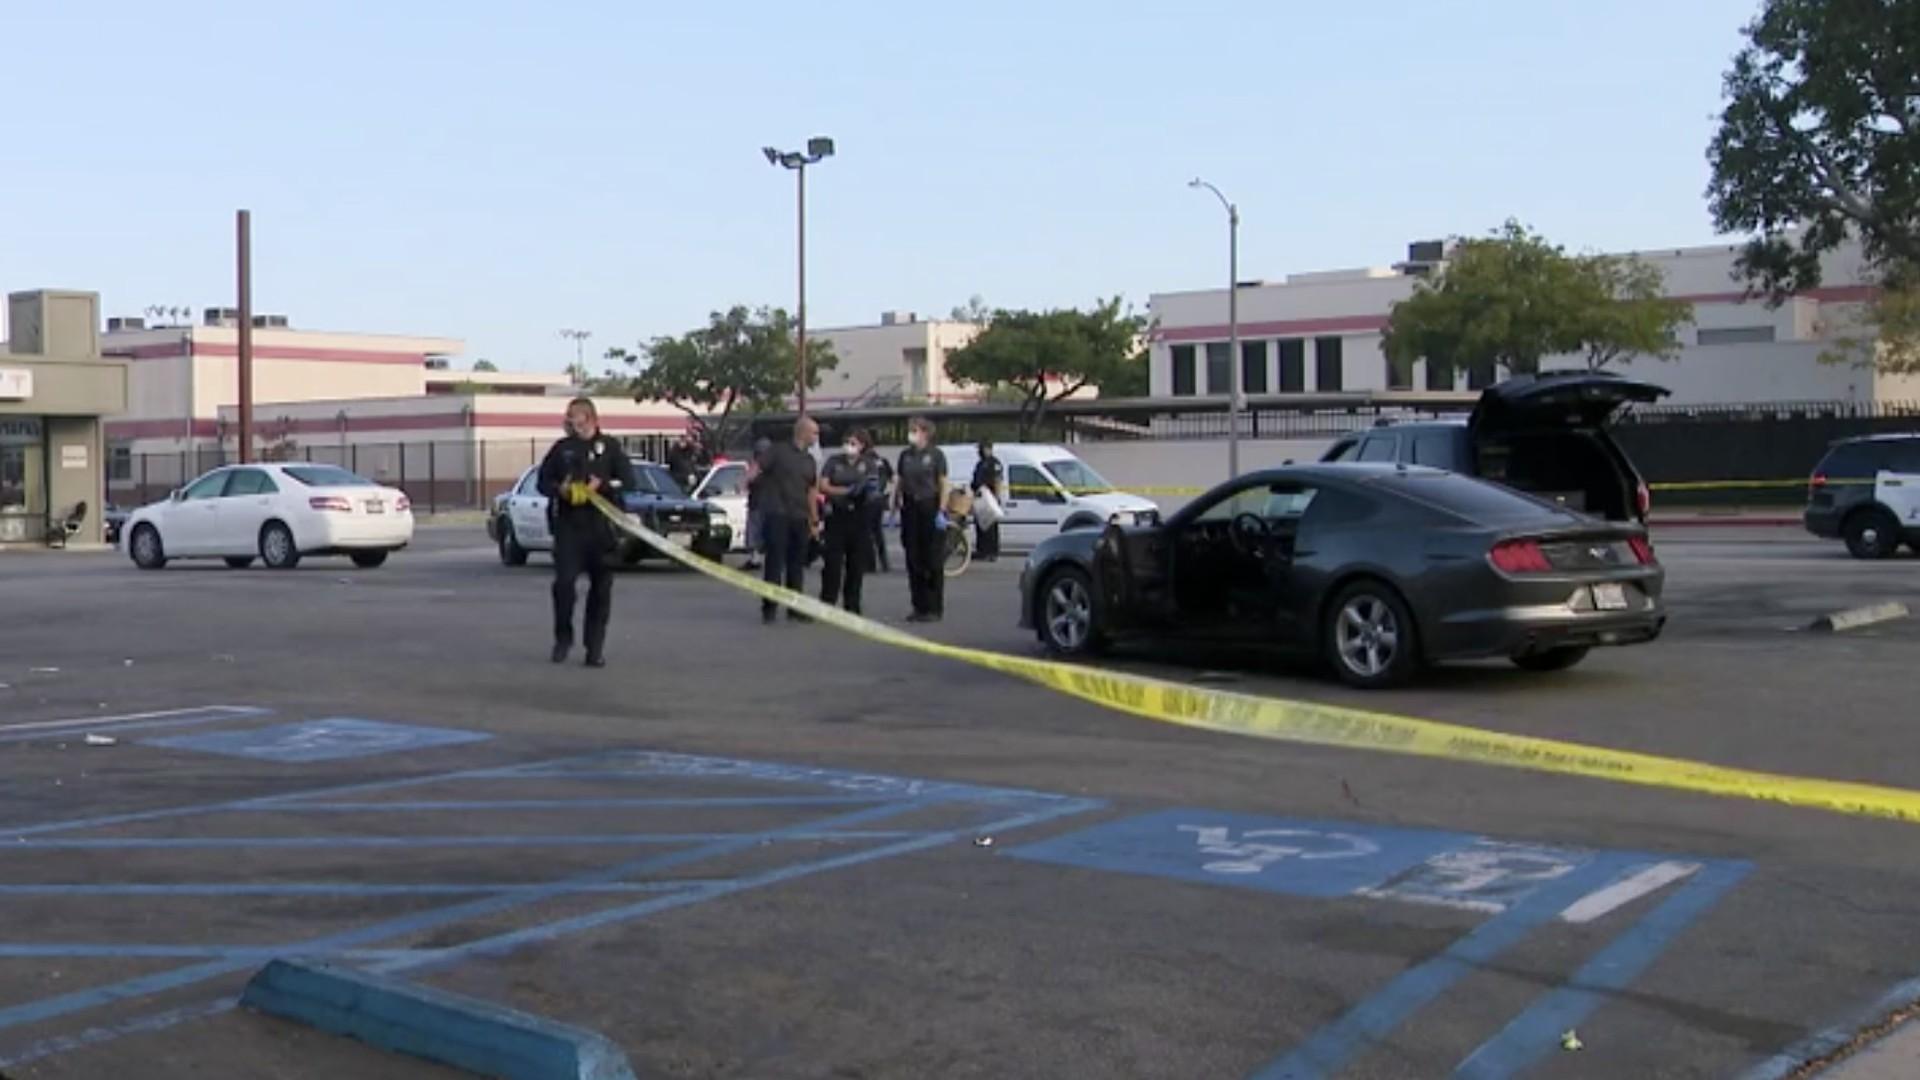 Police investigate a shooting in Glendale on July 30, 2020. (KTLA)